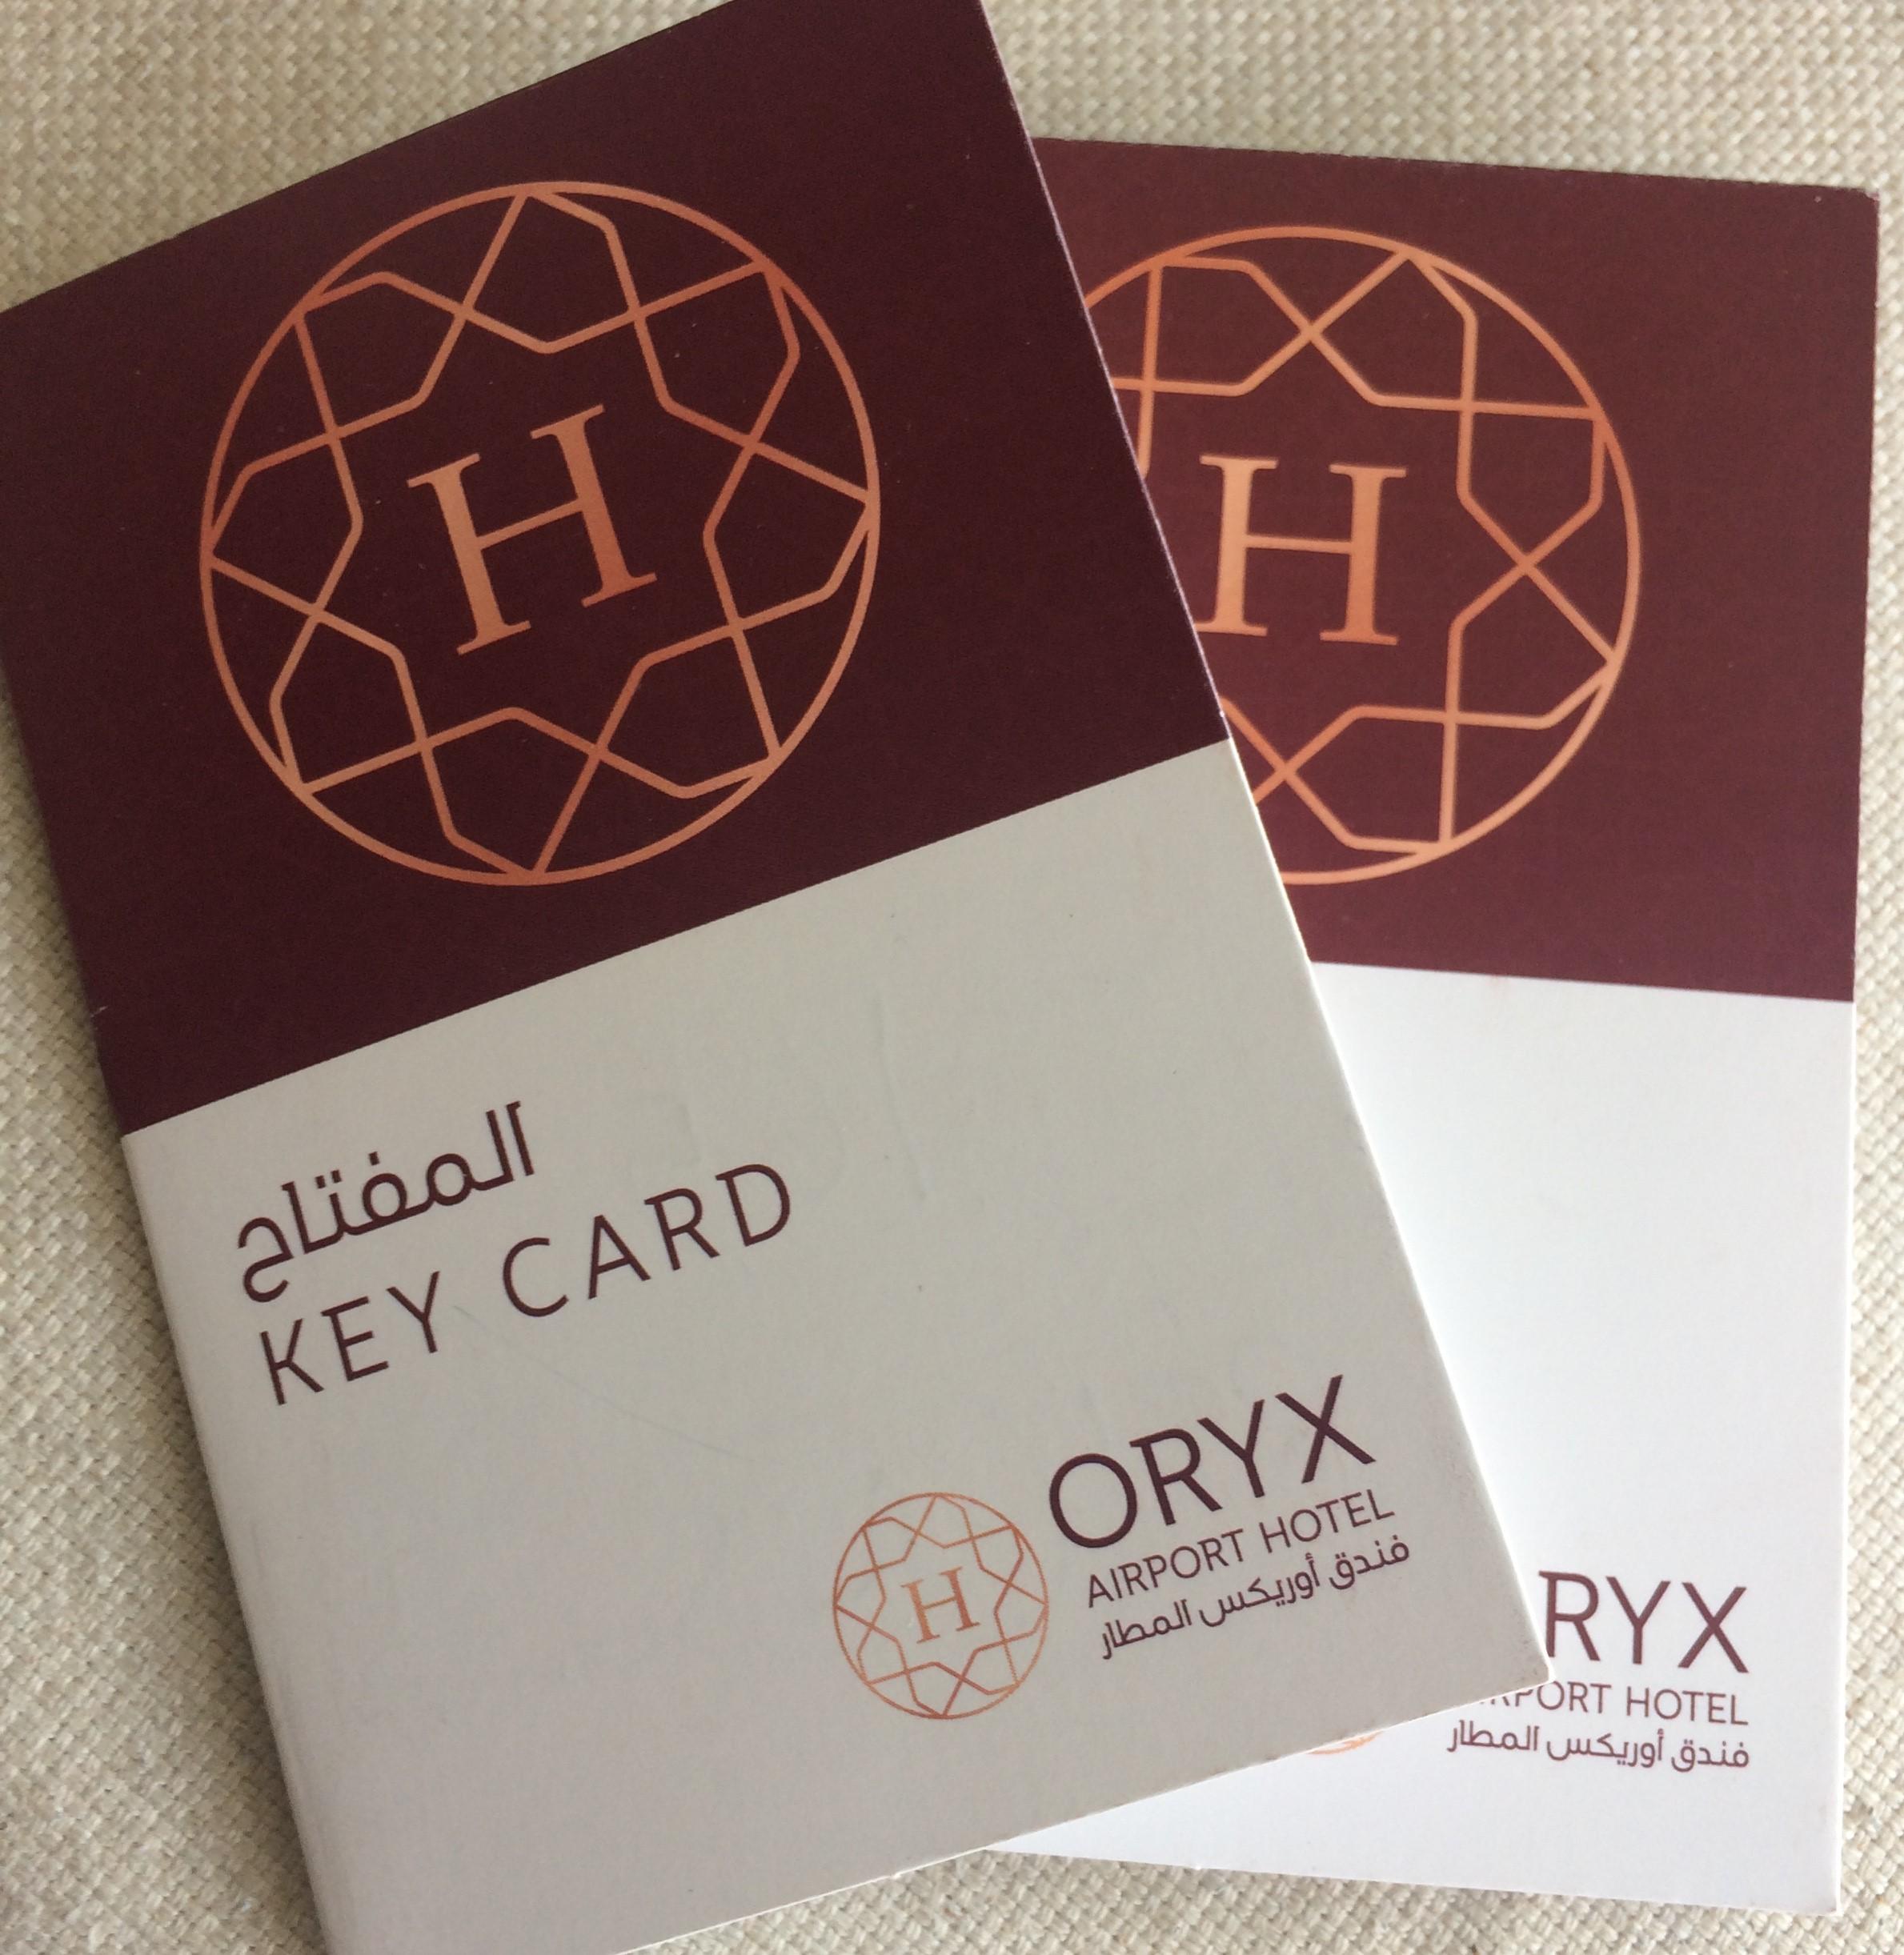 Key Card Covers Oryx Airport Hotel © Flyga Twiga LLC